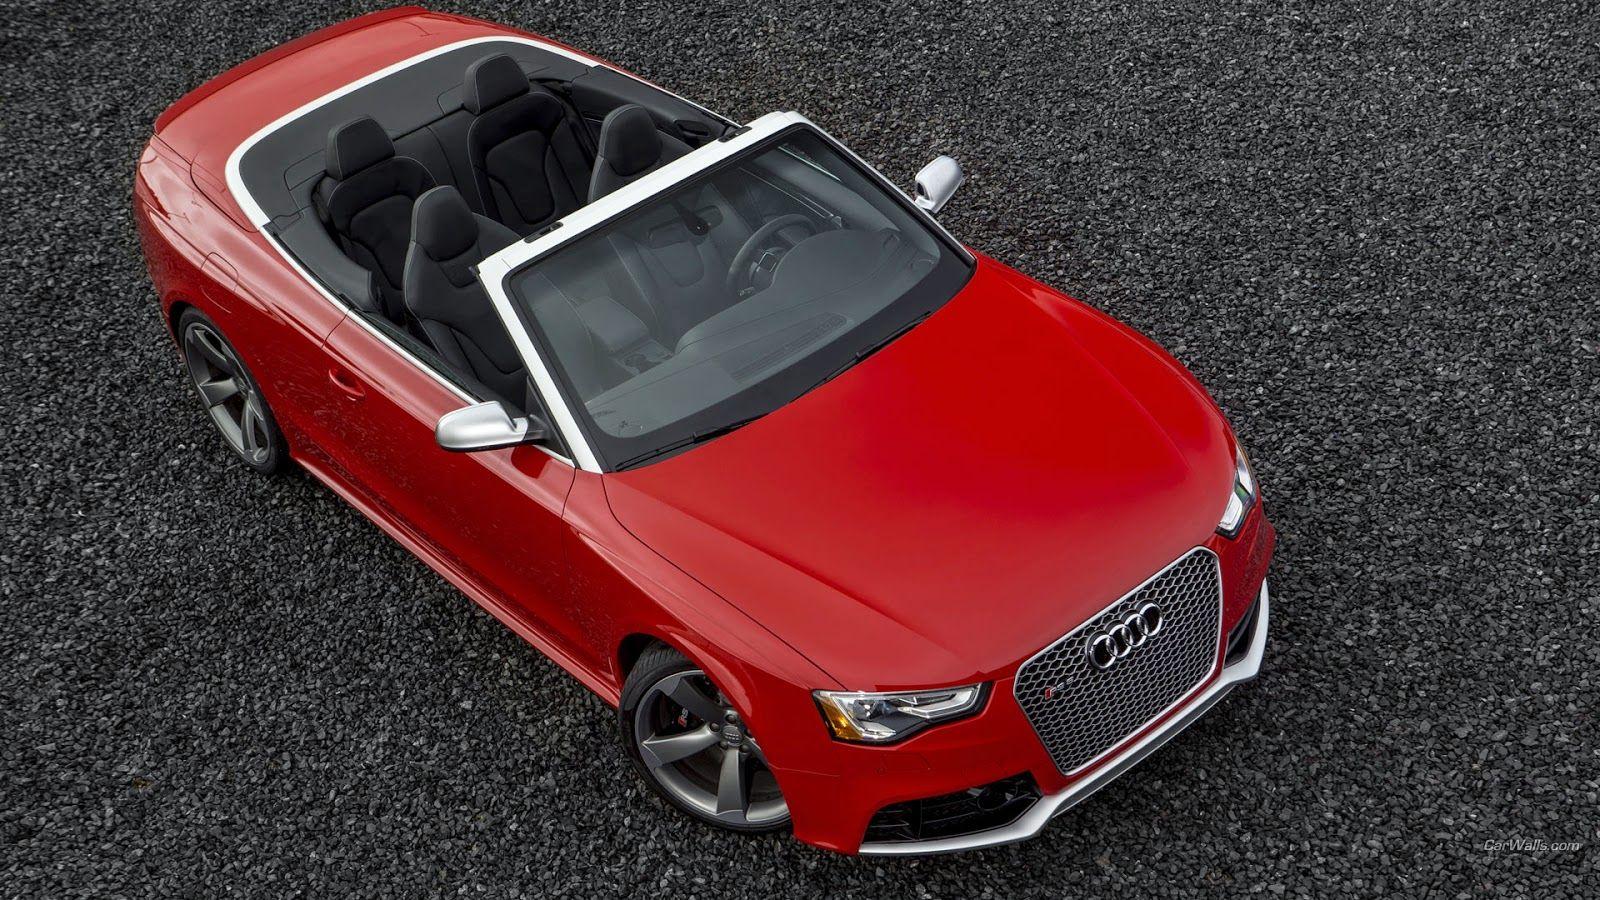 Audi Rs 5 A5 Cabrio Wallpaper Hd Free Wallpapers Audi Rs Audi Cars Audi